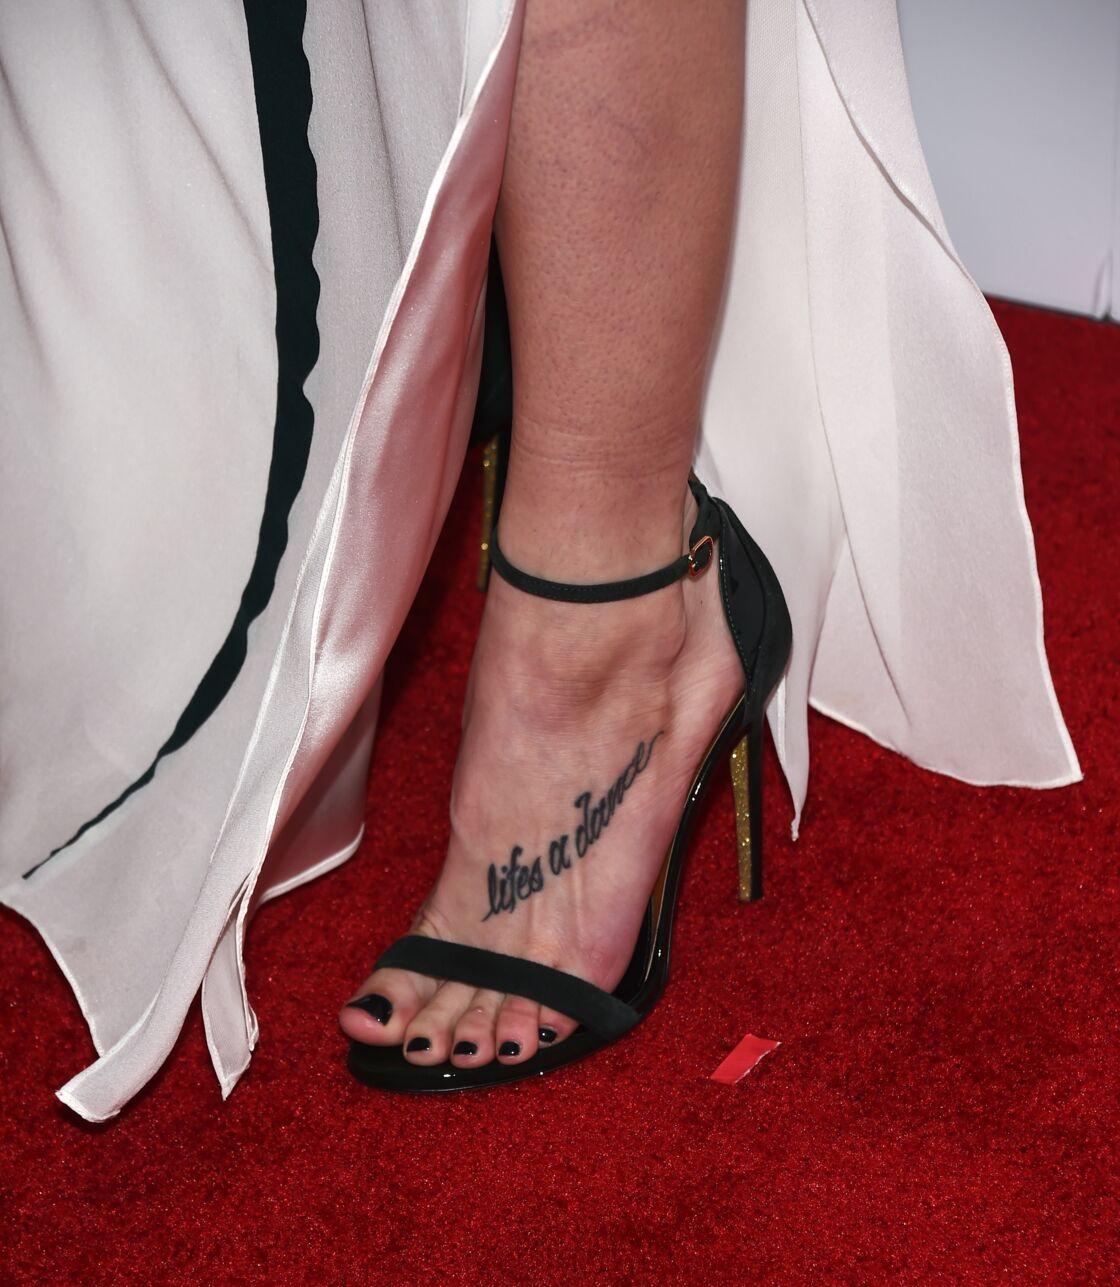 Tattoo Ecrit Le Tatouage De Phrase Voici